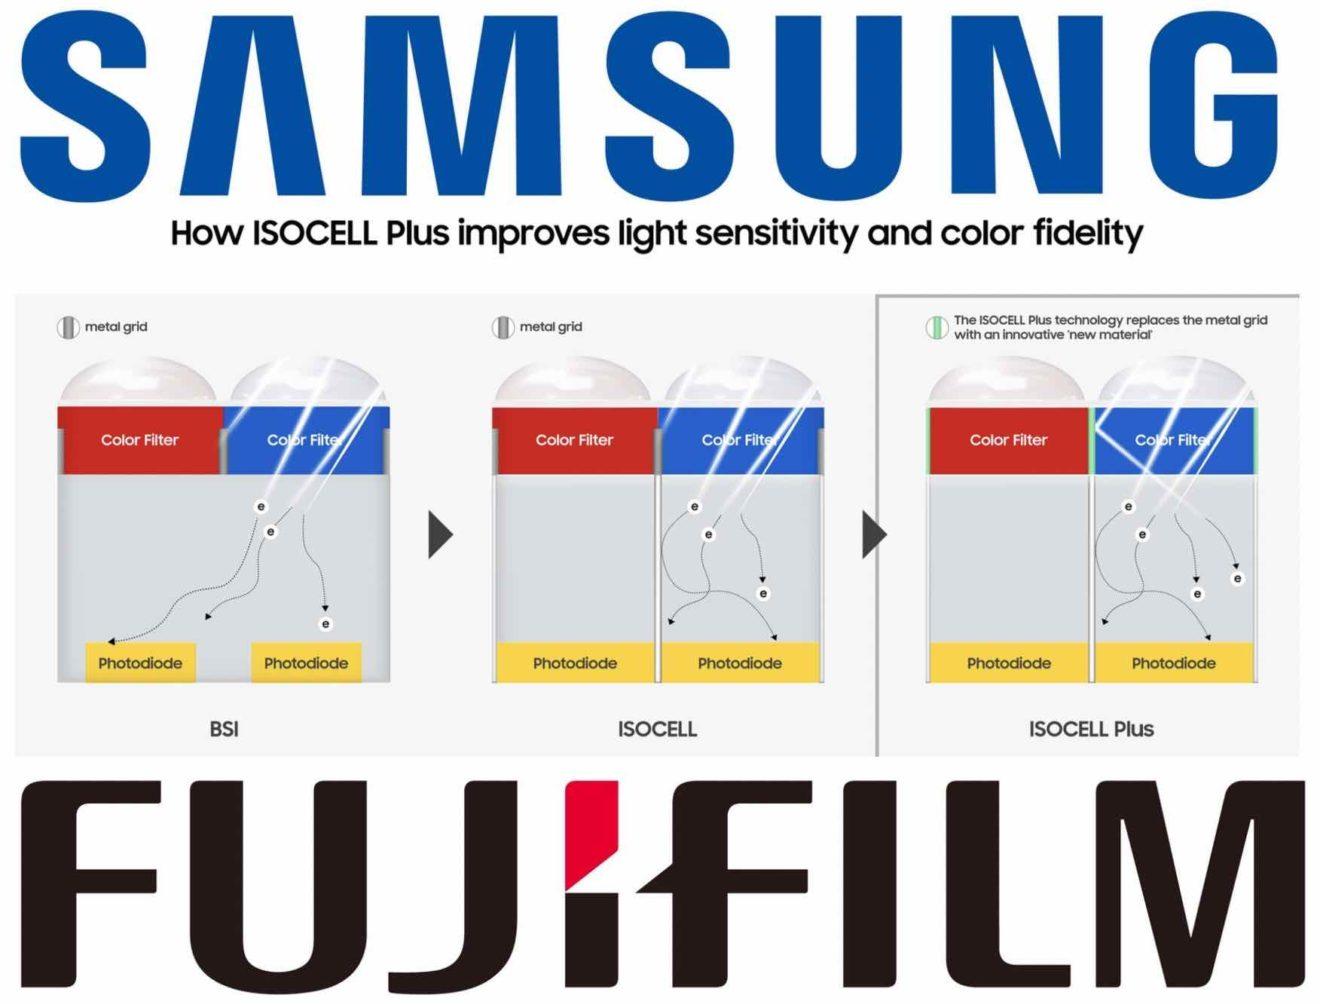 Технология ISOCELL Plus стала результатом сотрудничества Samsung и Fujifilm